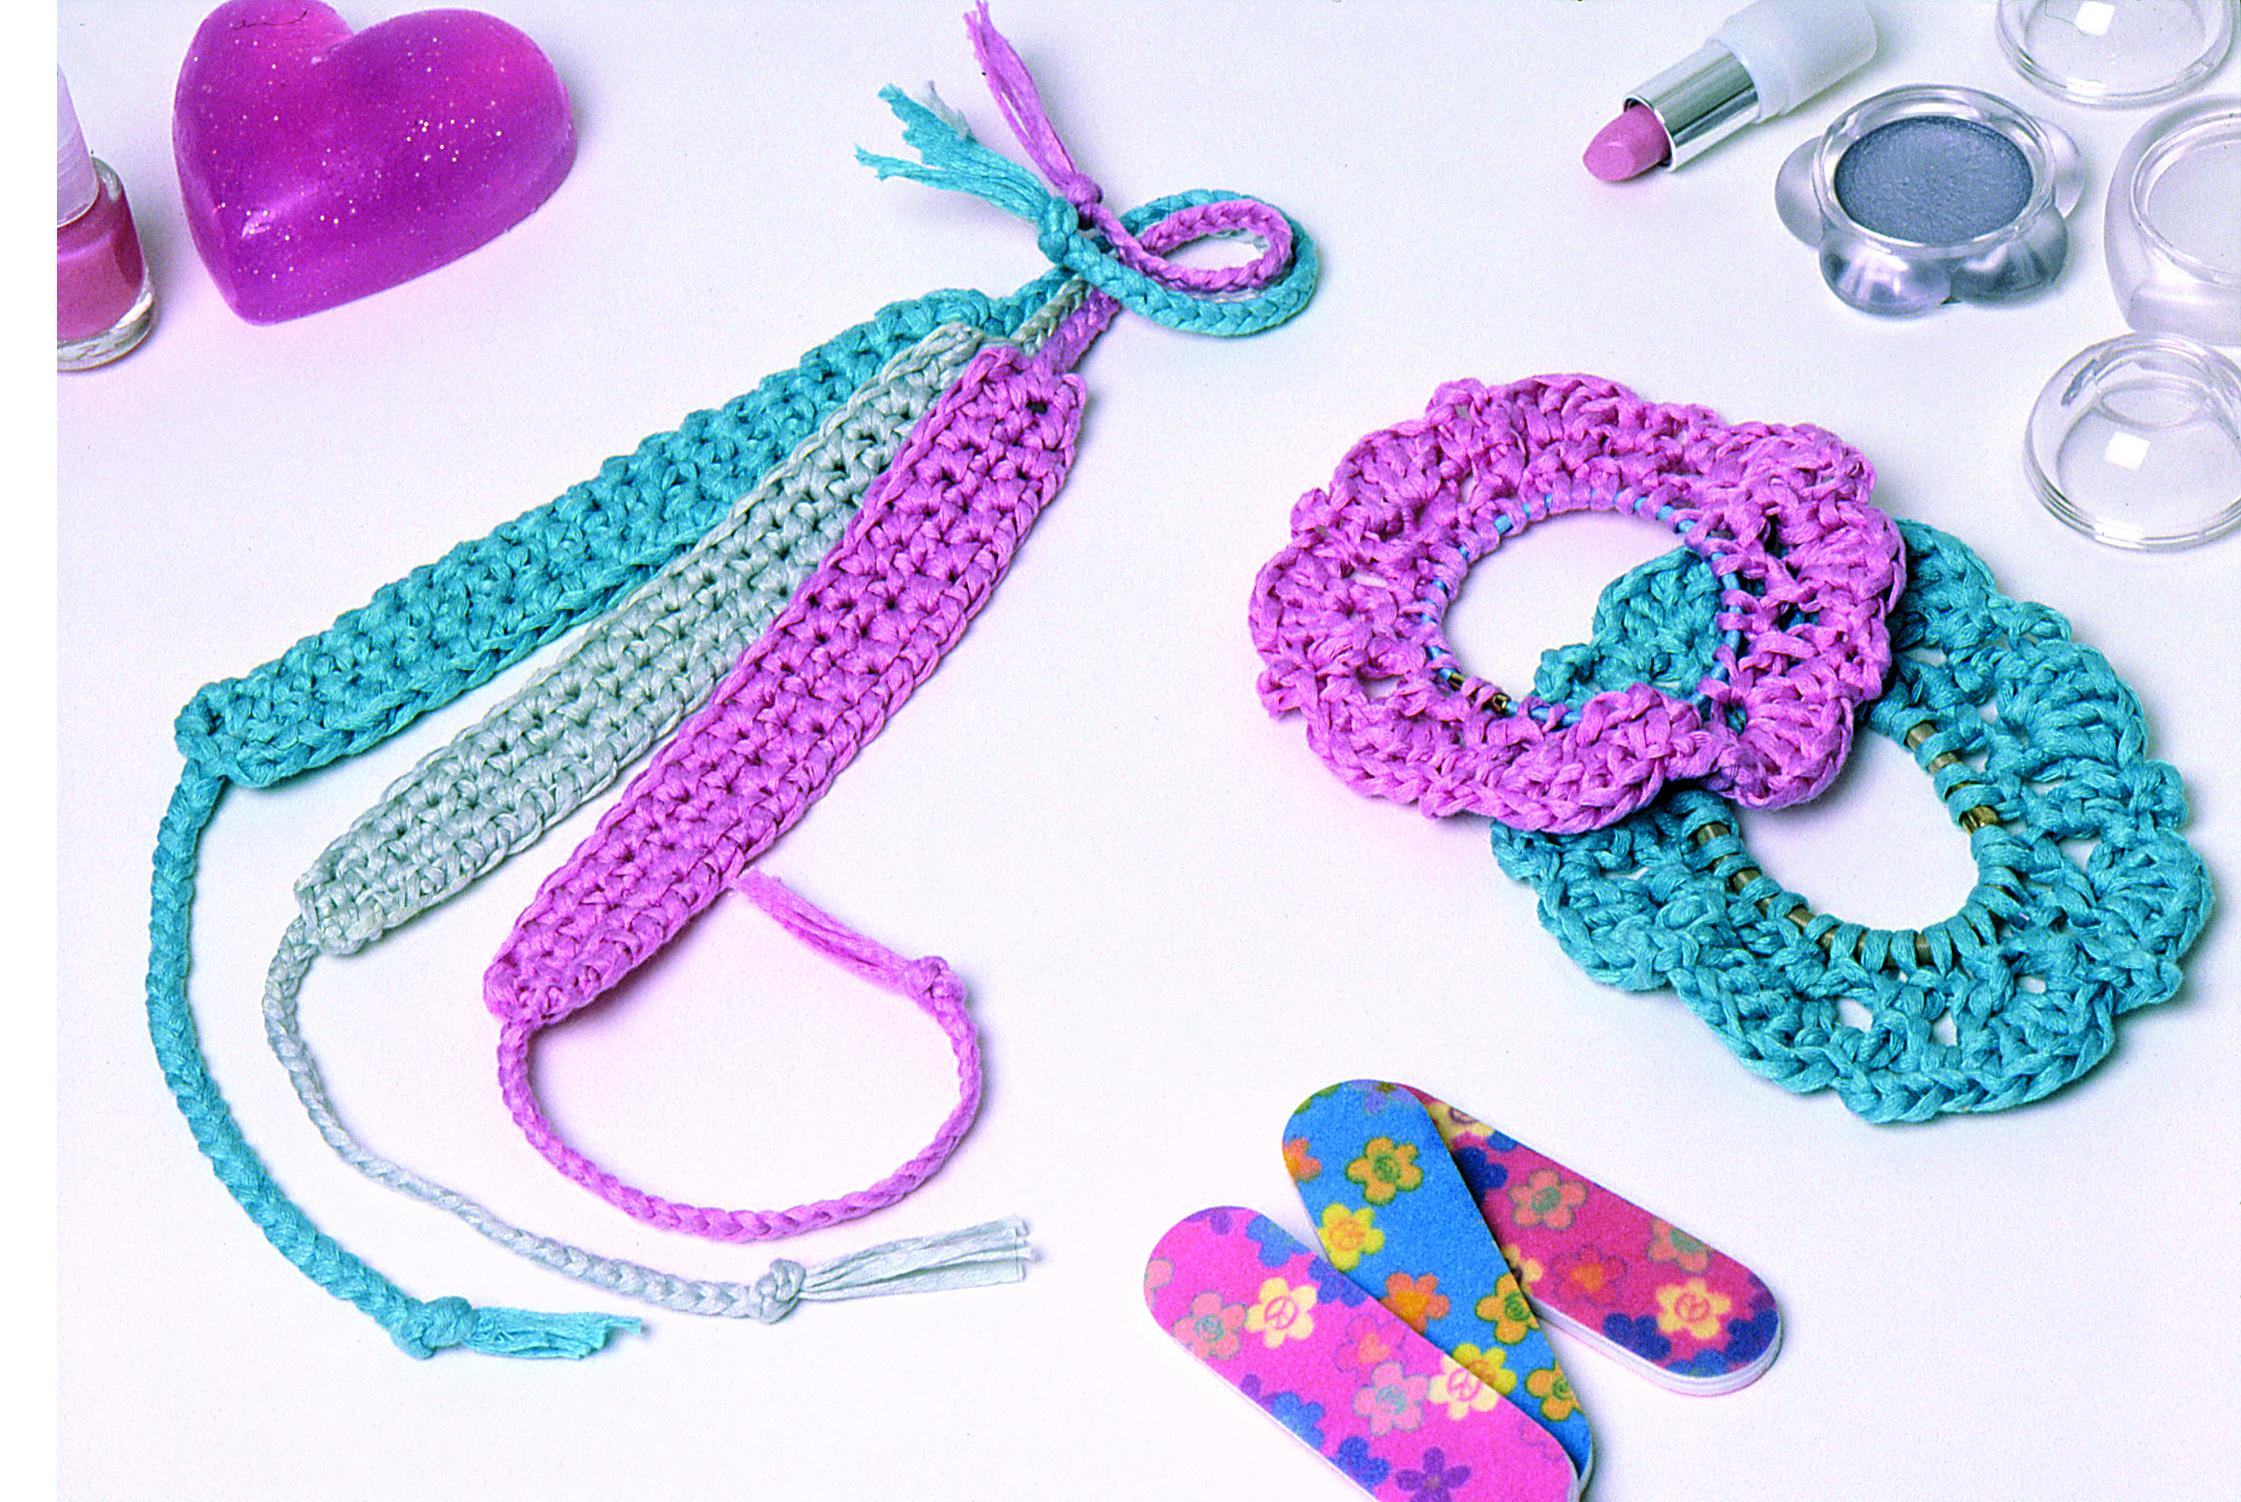 Free Crochet Patterns : Pottage Publishing